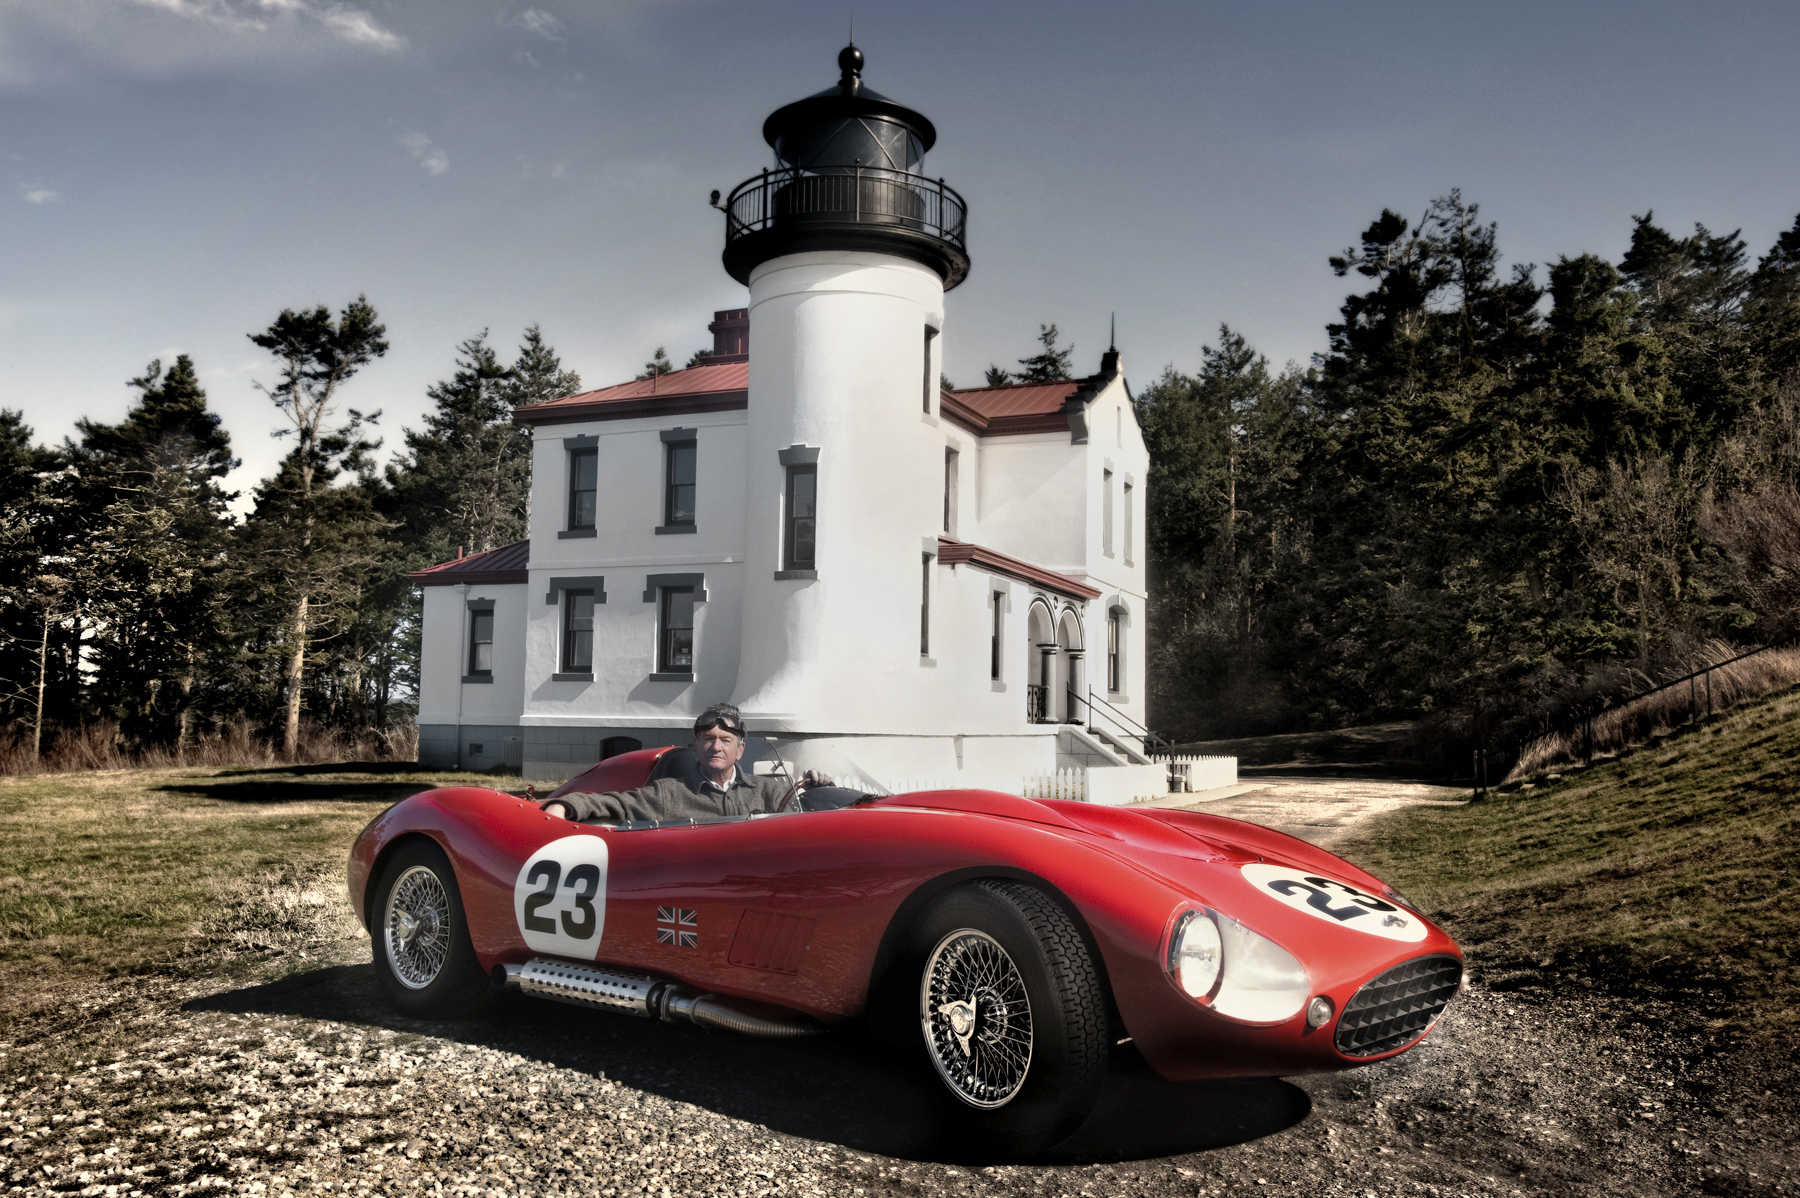 morgan_vintage cars_photography 10